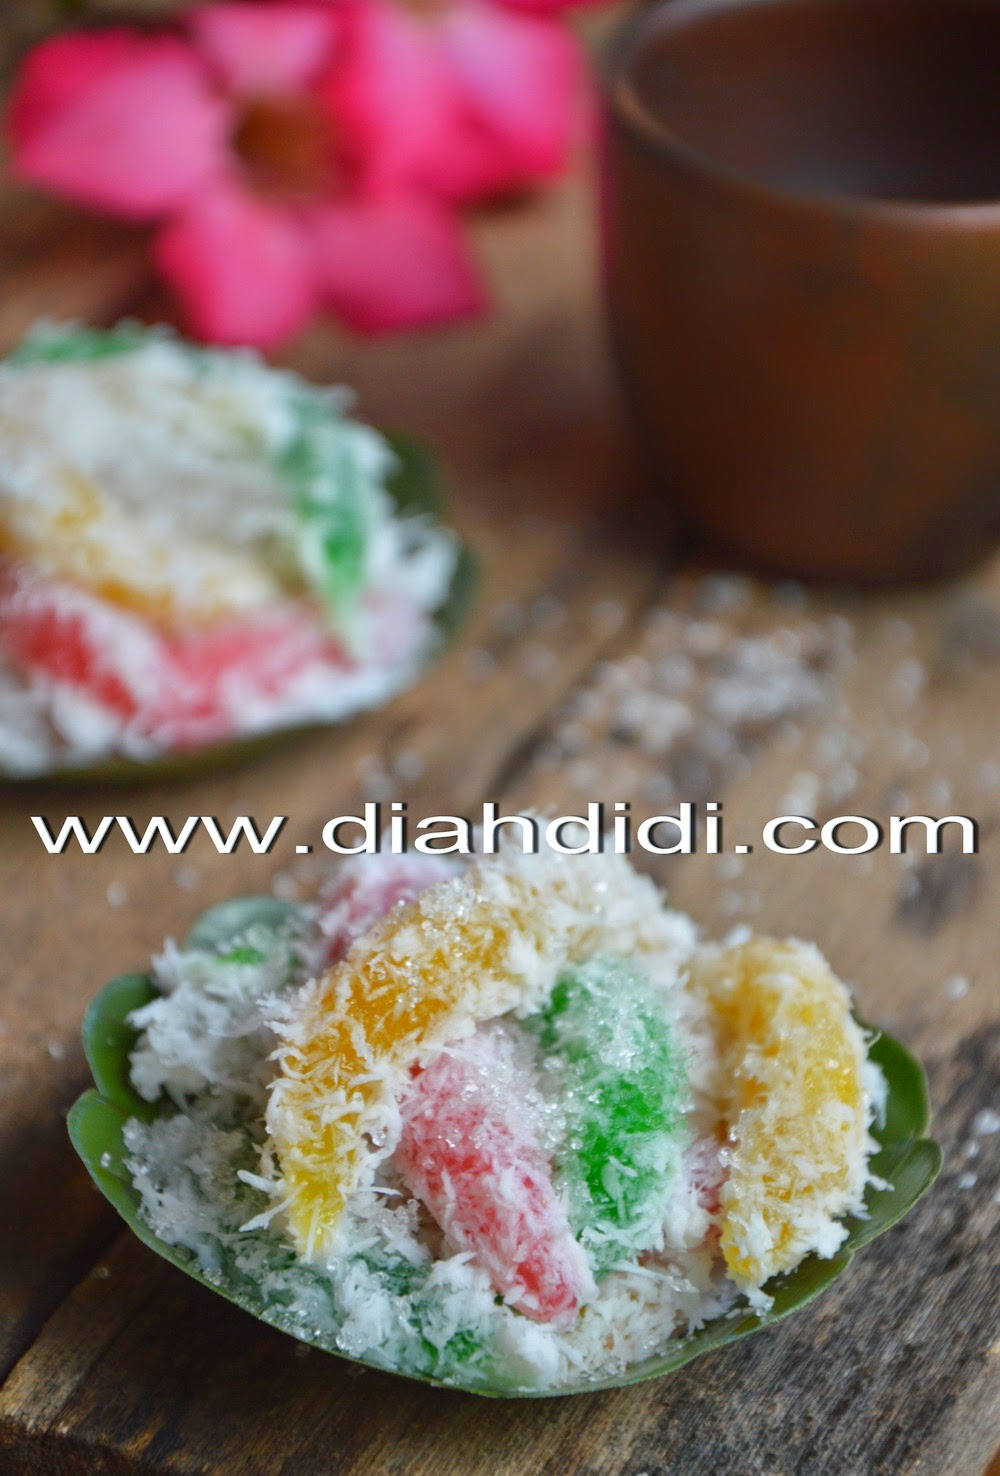 Diah Didis Kitchen Cenil Versi Resep Baru